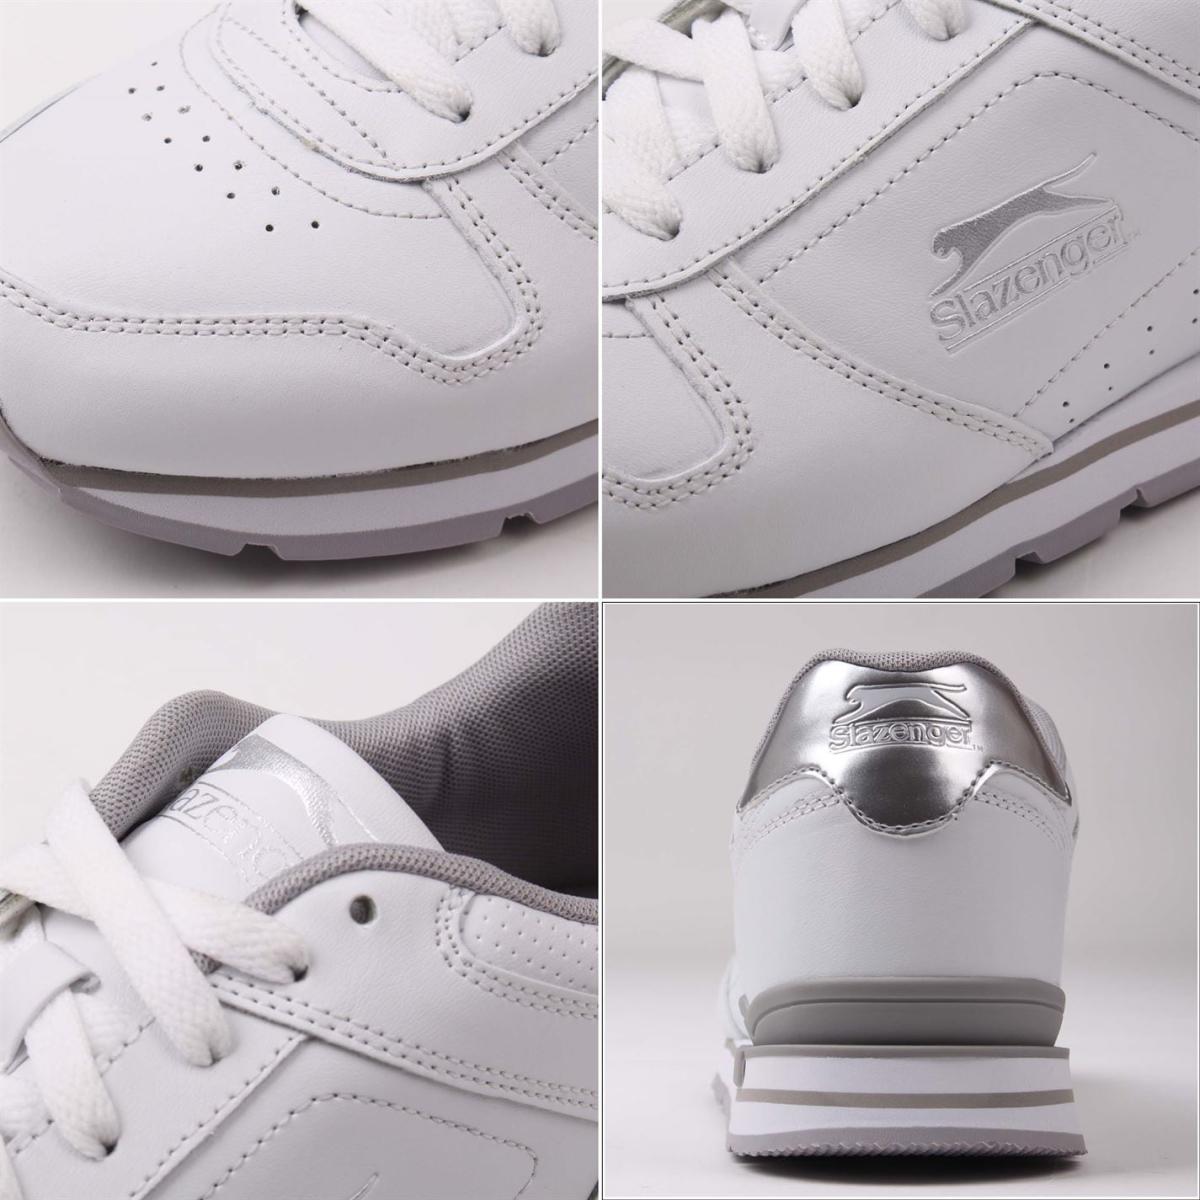 Slazenger-Classic-Turnschuhe-Laufschuhe-Damen-Sportschuhe-Sneaker-1265 Indexbild 29